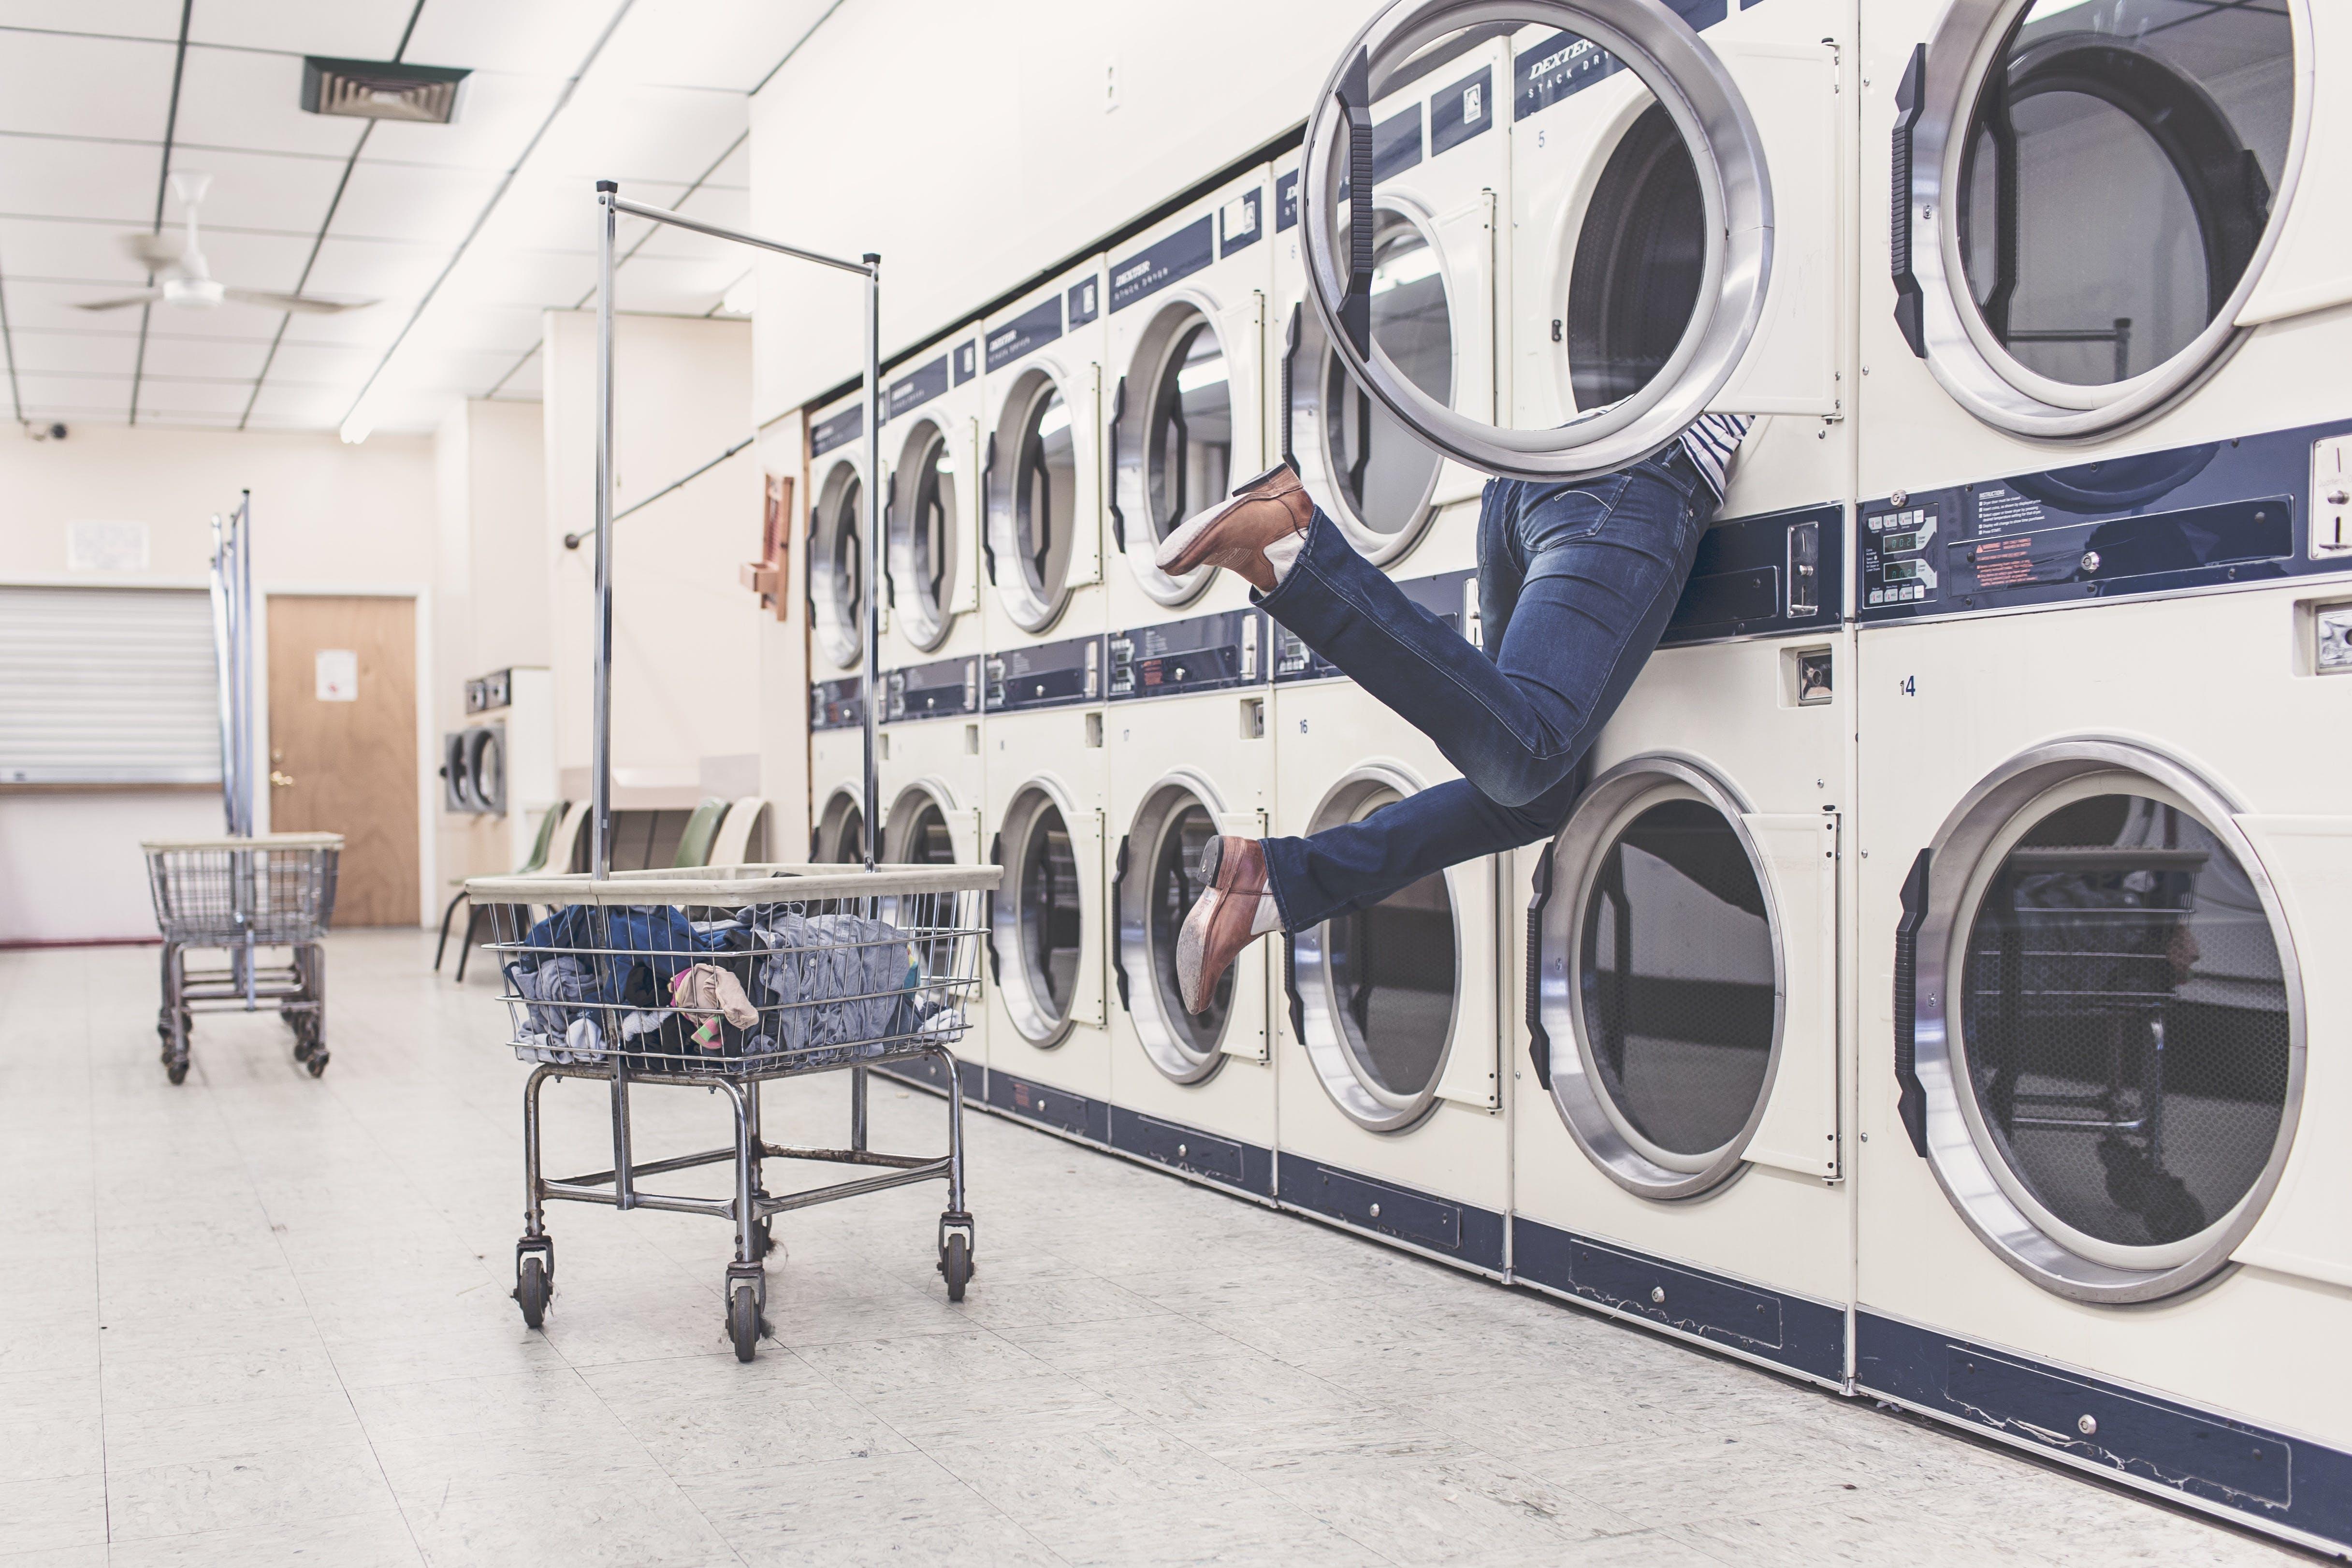 Free stock photo of people, woman, laundromat, laundry